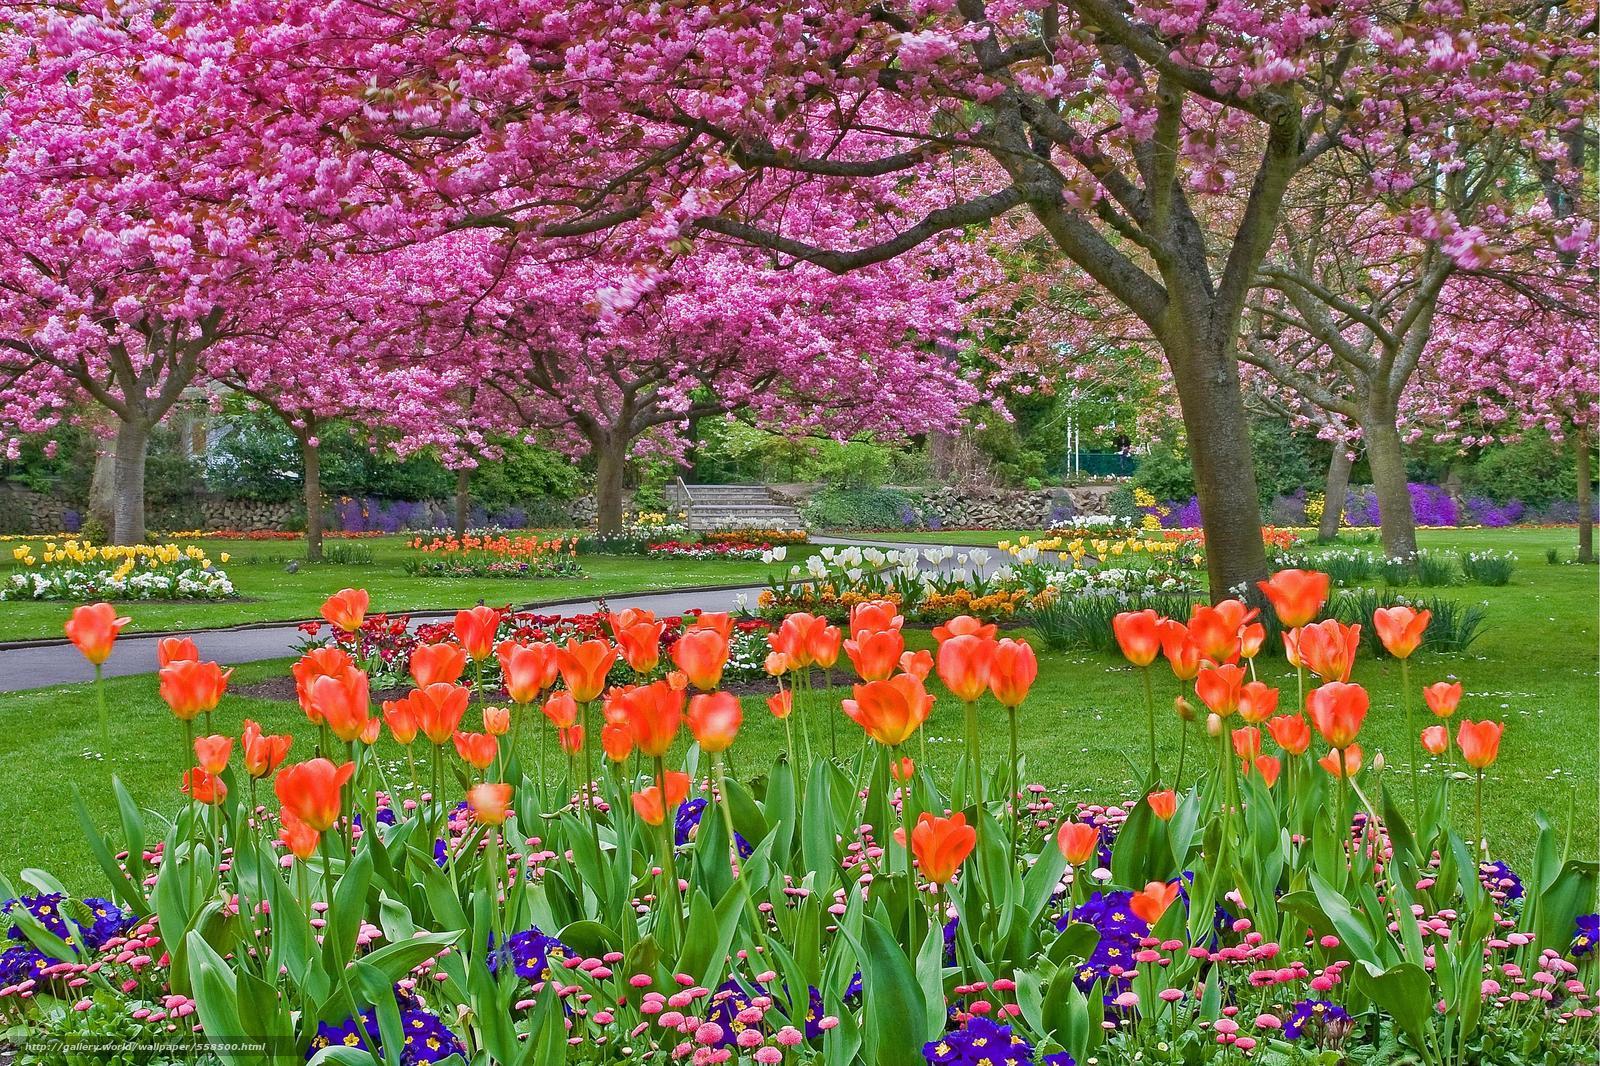 Tlcharger Fond D'ecran Jardin, Parc, Arbres, Fleurs Fonds